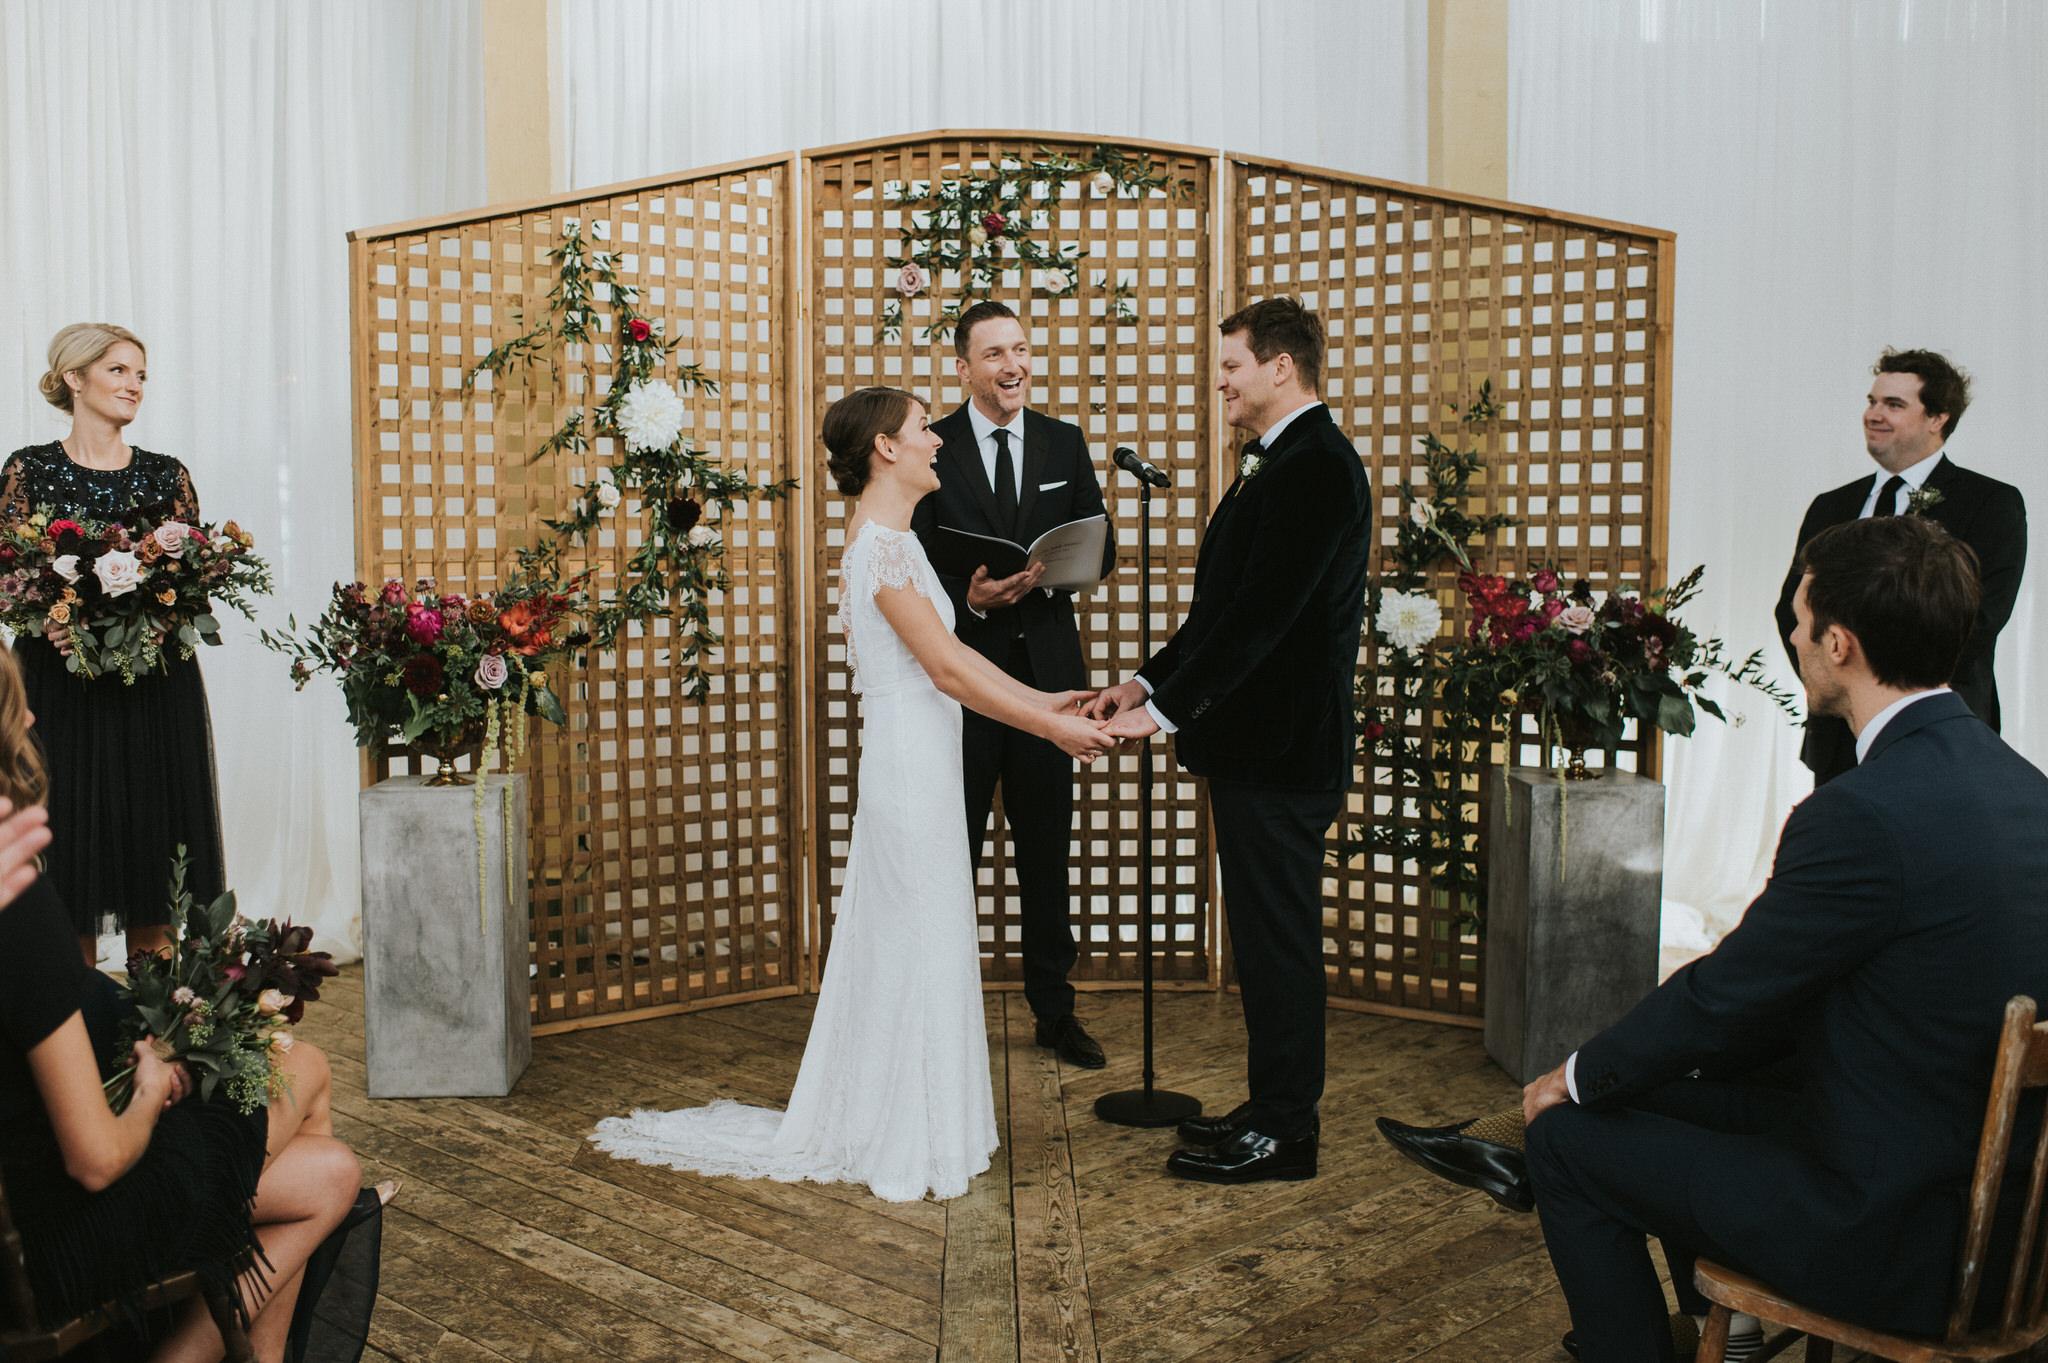 scarletoneillphotography_weddingphotography_prince edward county weddings112.JPG